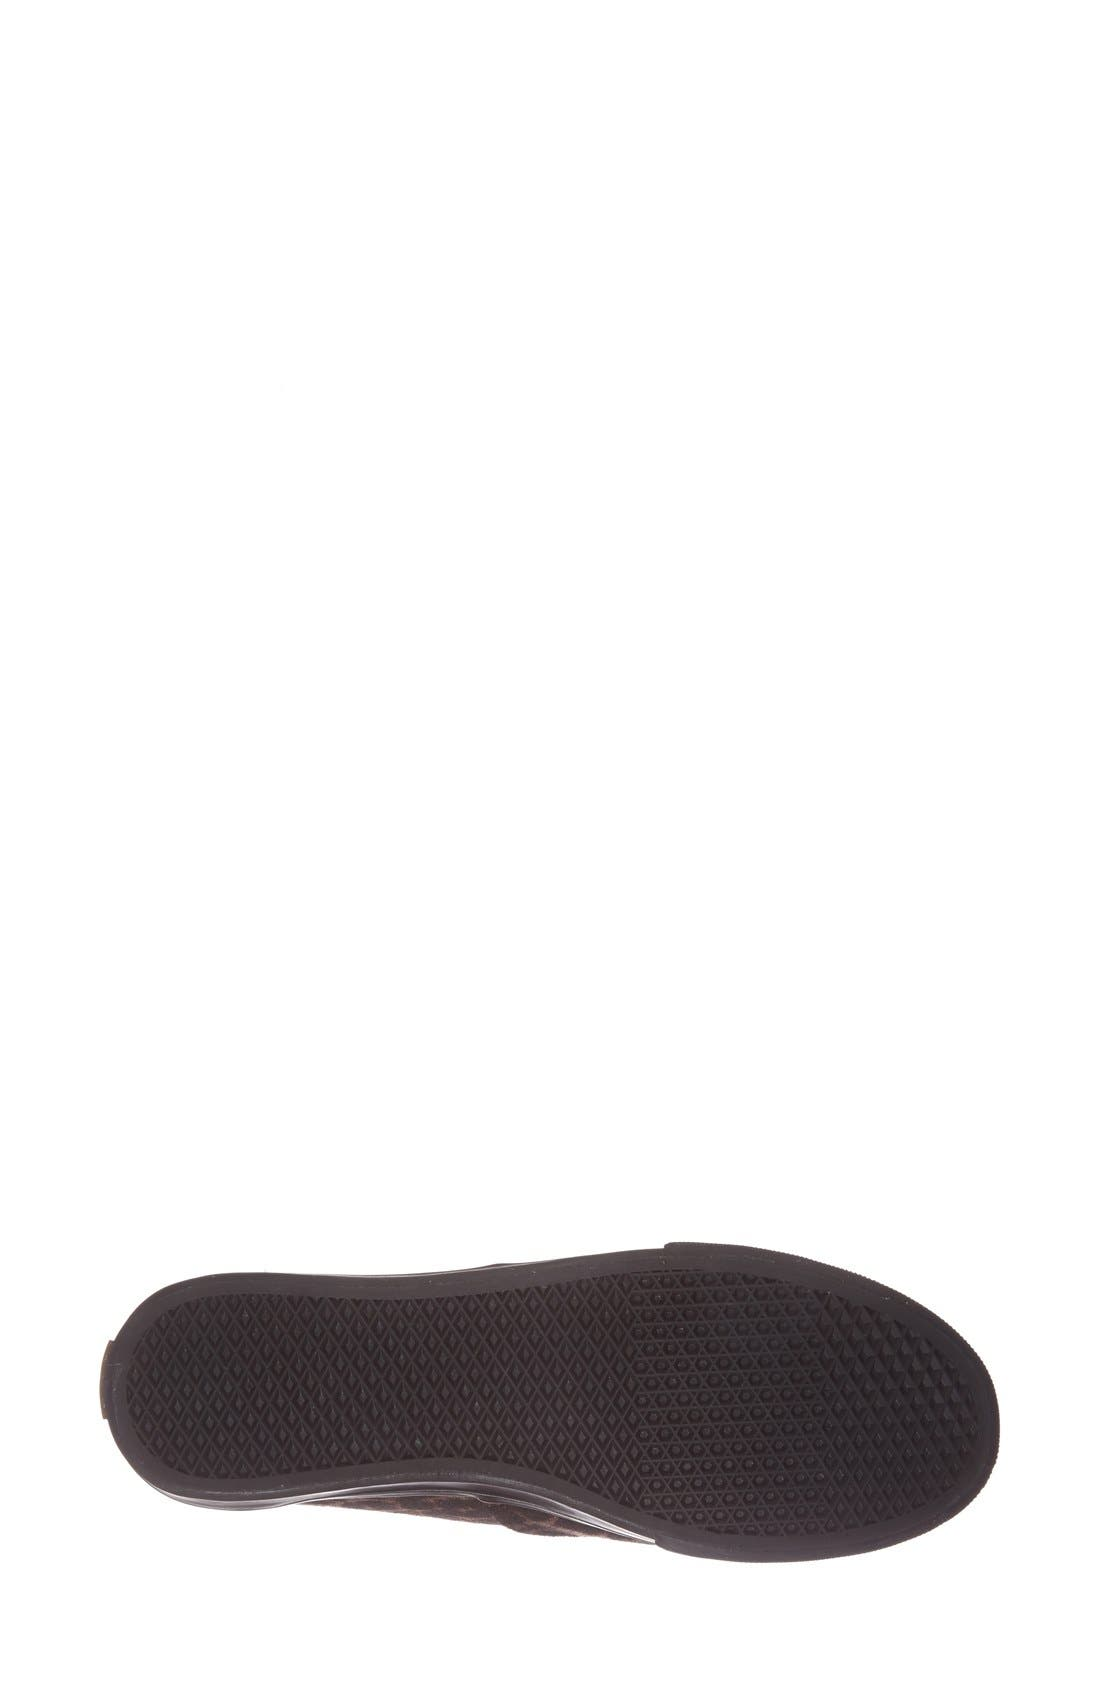 Alternate Image 4  - Vans 'Authentic - Lo Pro' Leopard Print Sneaker (Women)